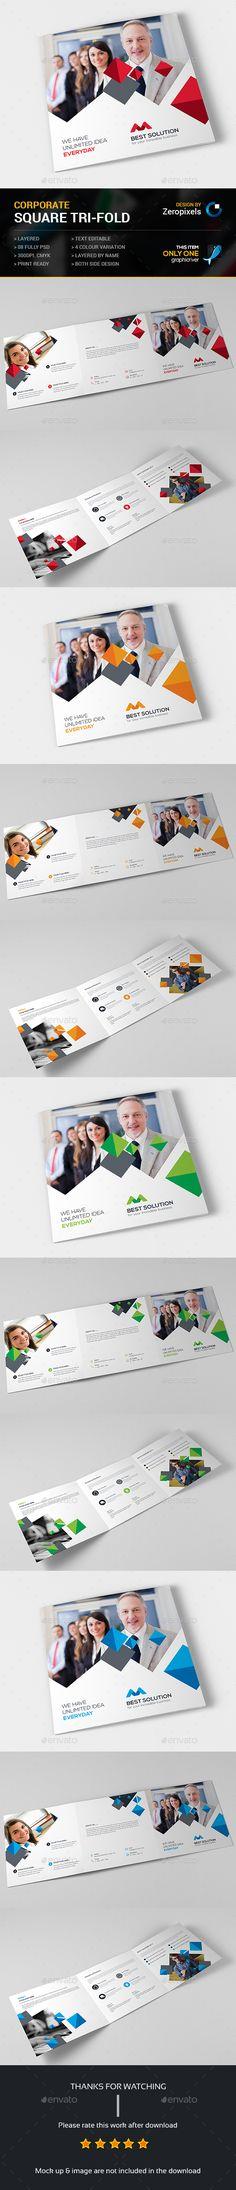 Square Tri-fold Brochure Template PSD. Download here: http://graphicriver.net/item/square-trifold-brochure/14885953?ref=ksioks